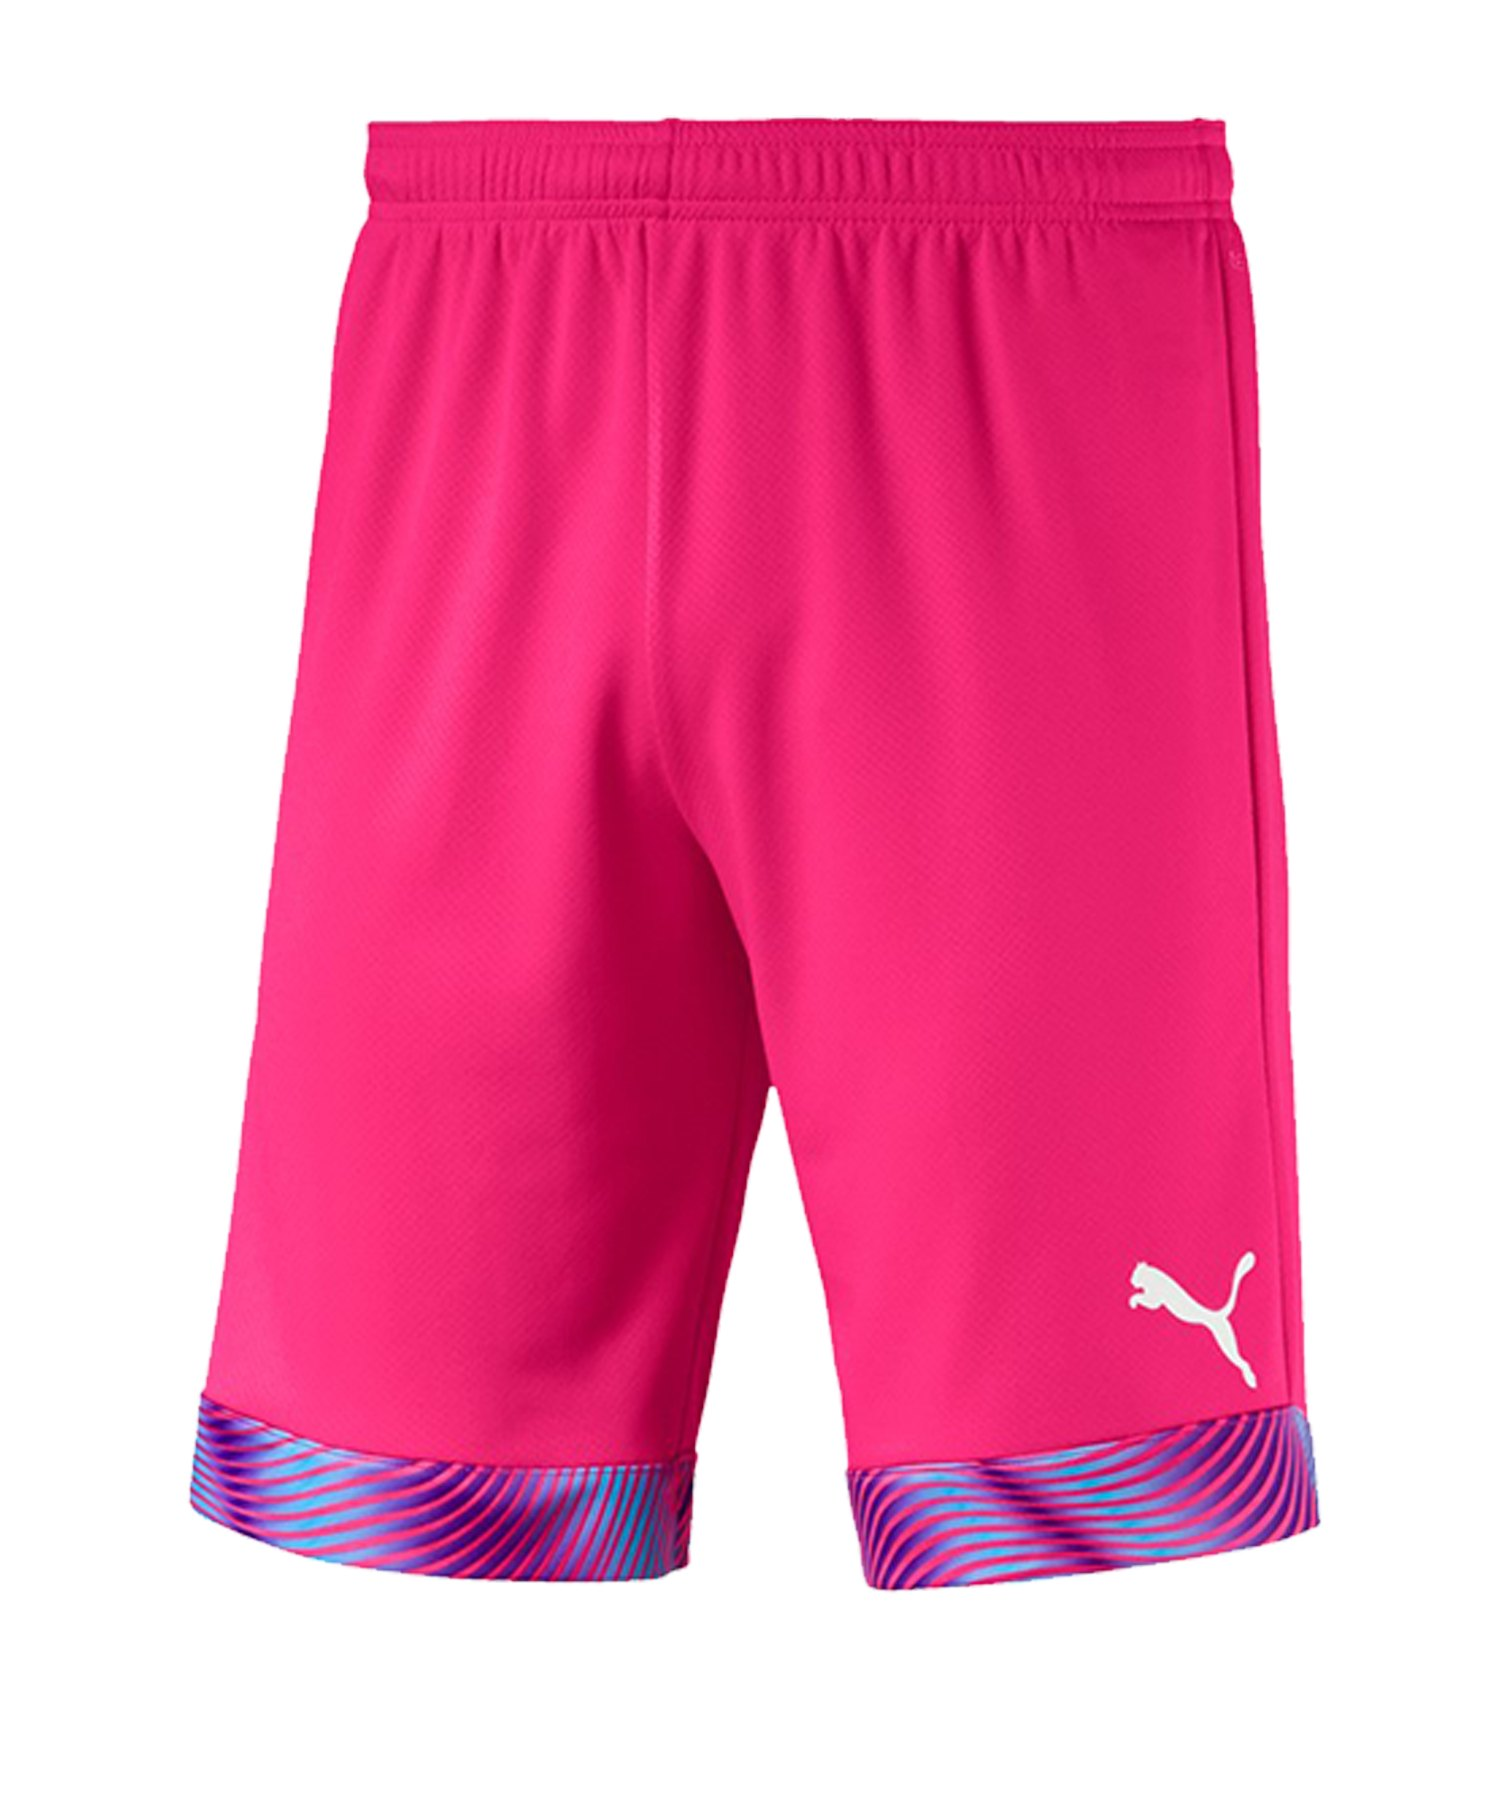 PUMA CUP Short Pink Lila Weiss F41 - pink